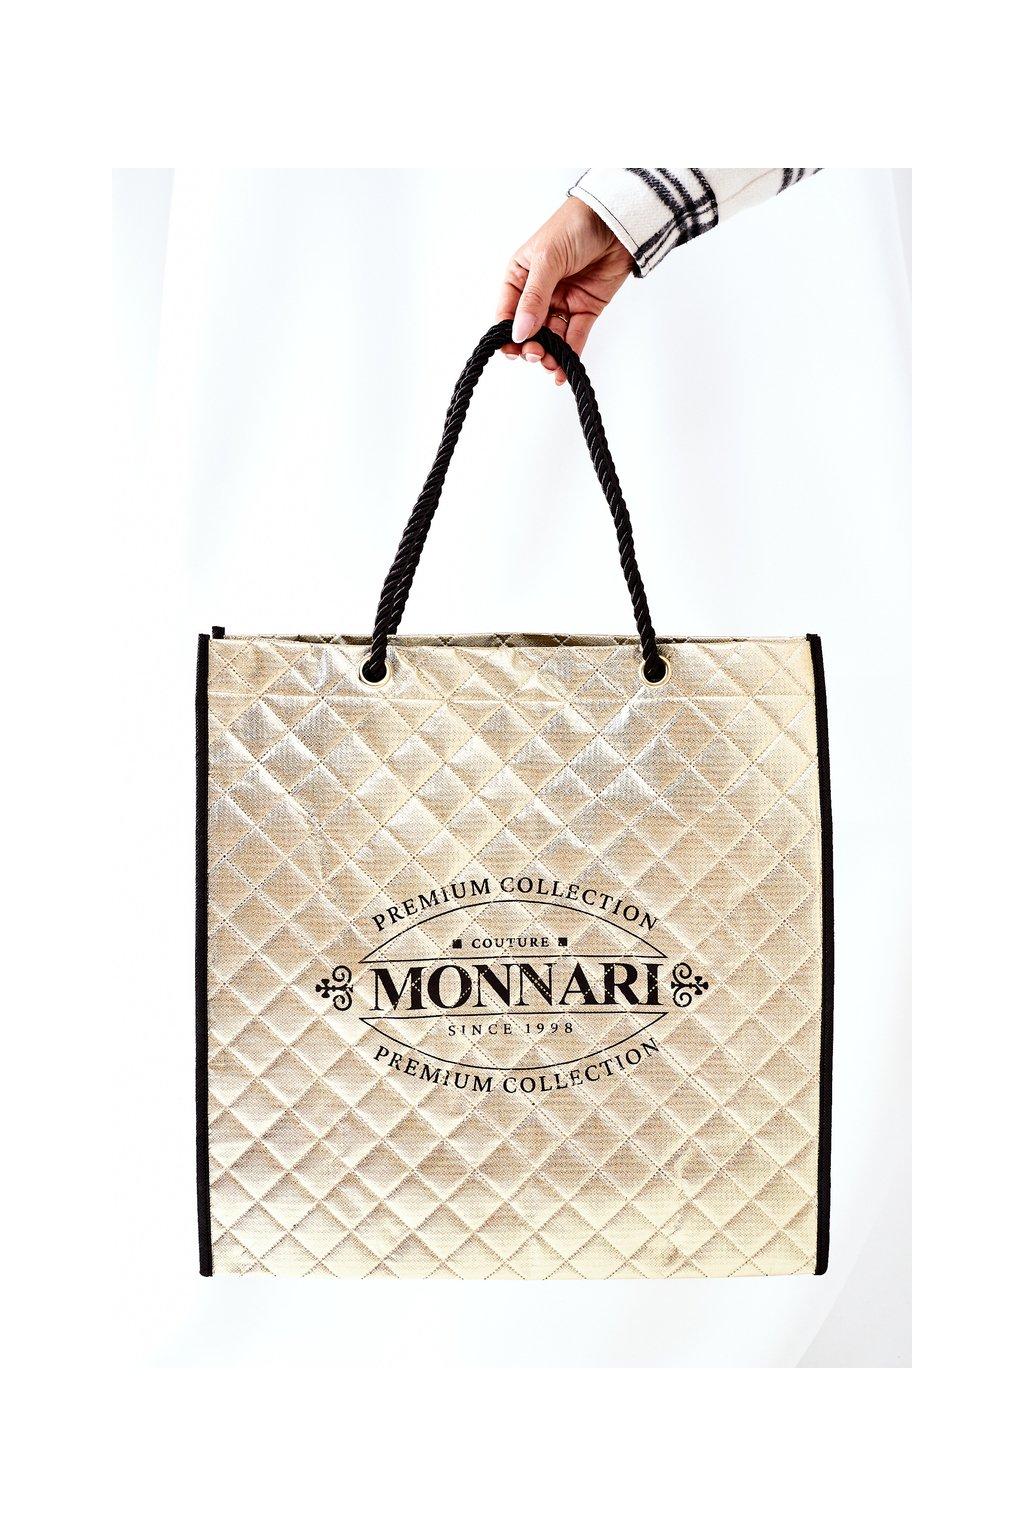 Dámská Taška Shopper Monnari zlatá BAG0030-023